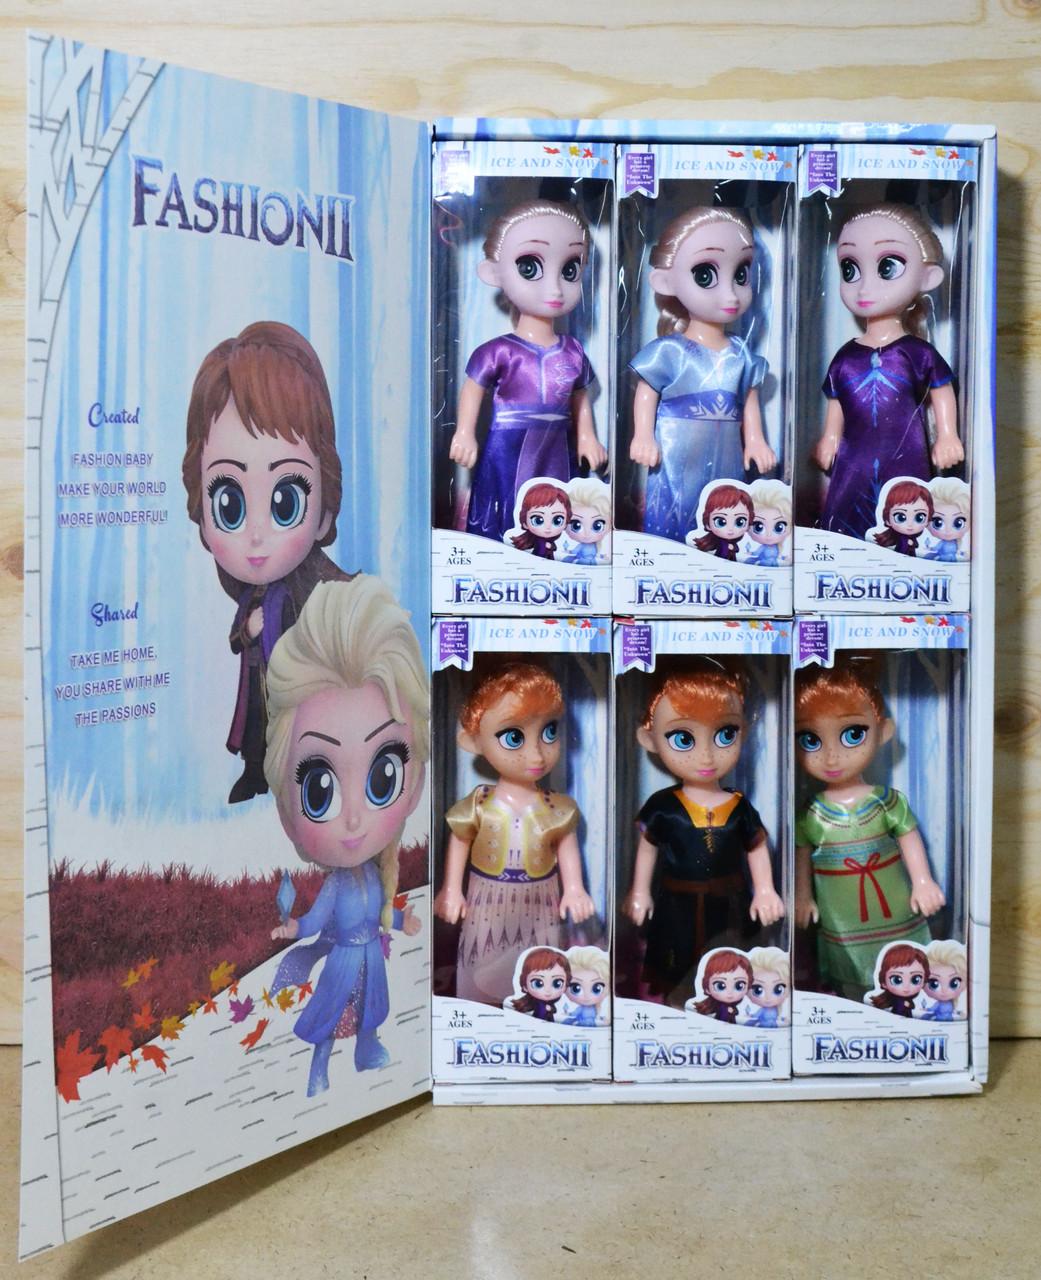 YXB06 Кукла Fashion холодное сердце 2 вида, 6 шт в уп., цена за 1шт 17*7